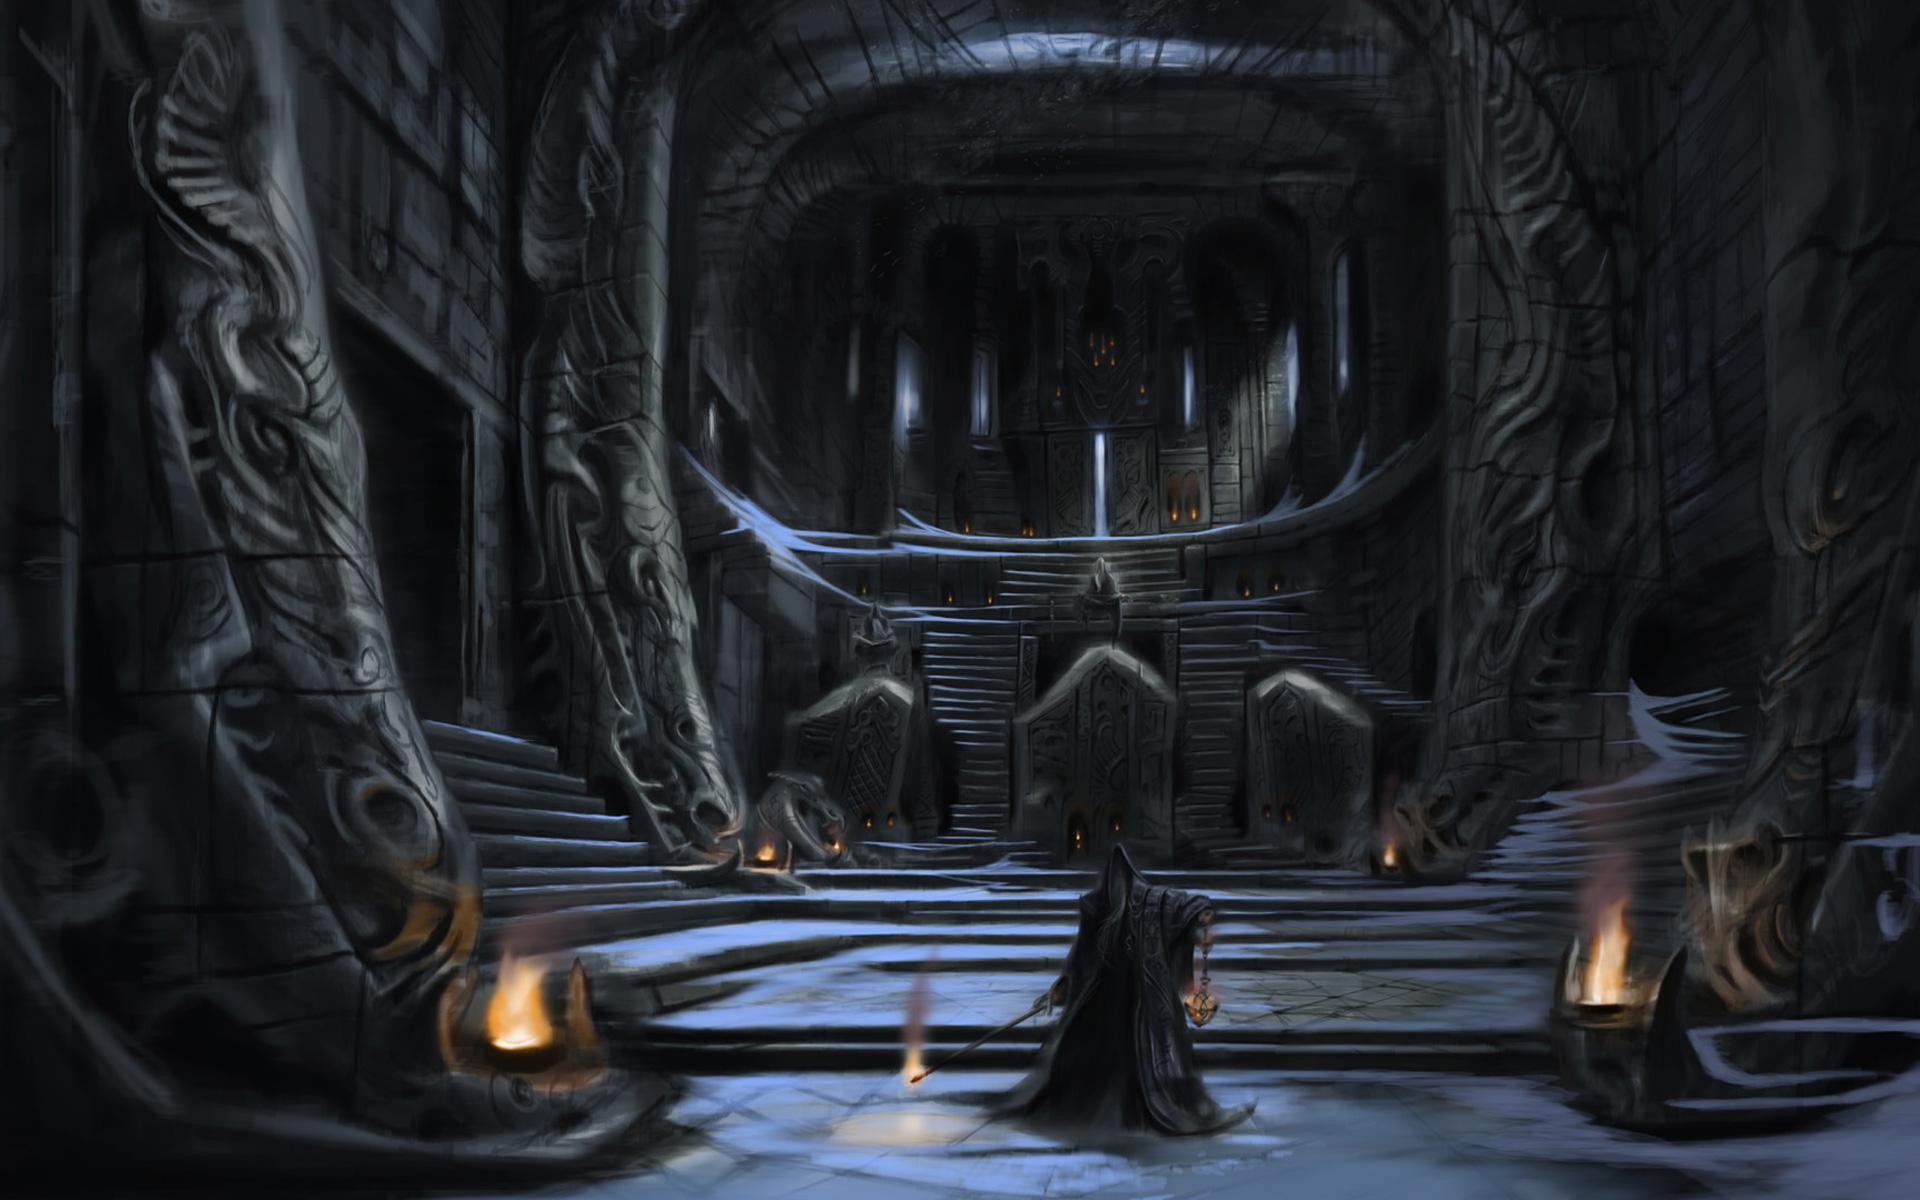 Free The Elder Scrolls V: Skyrim Wallpaper in 1920x1200